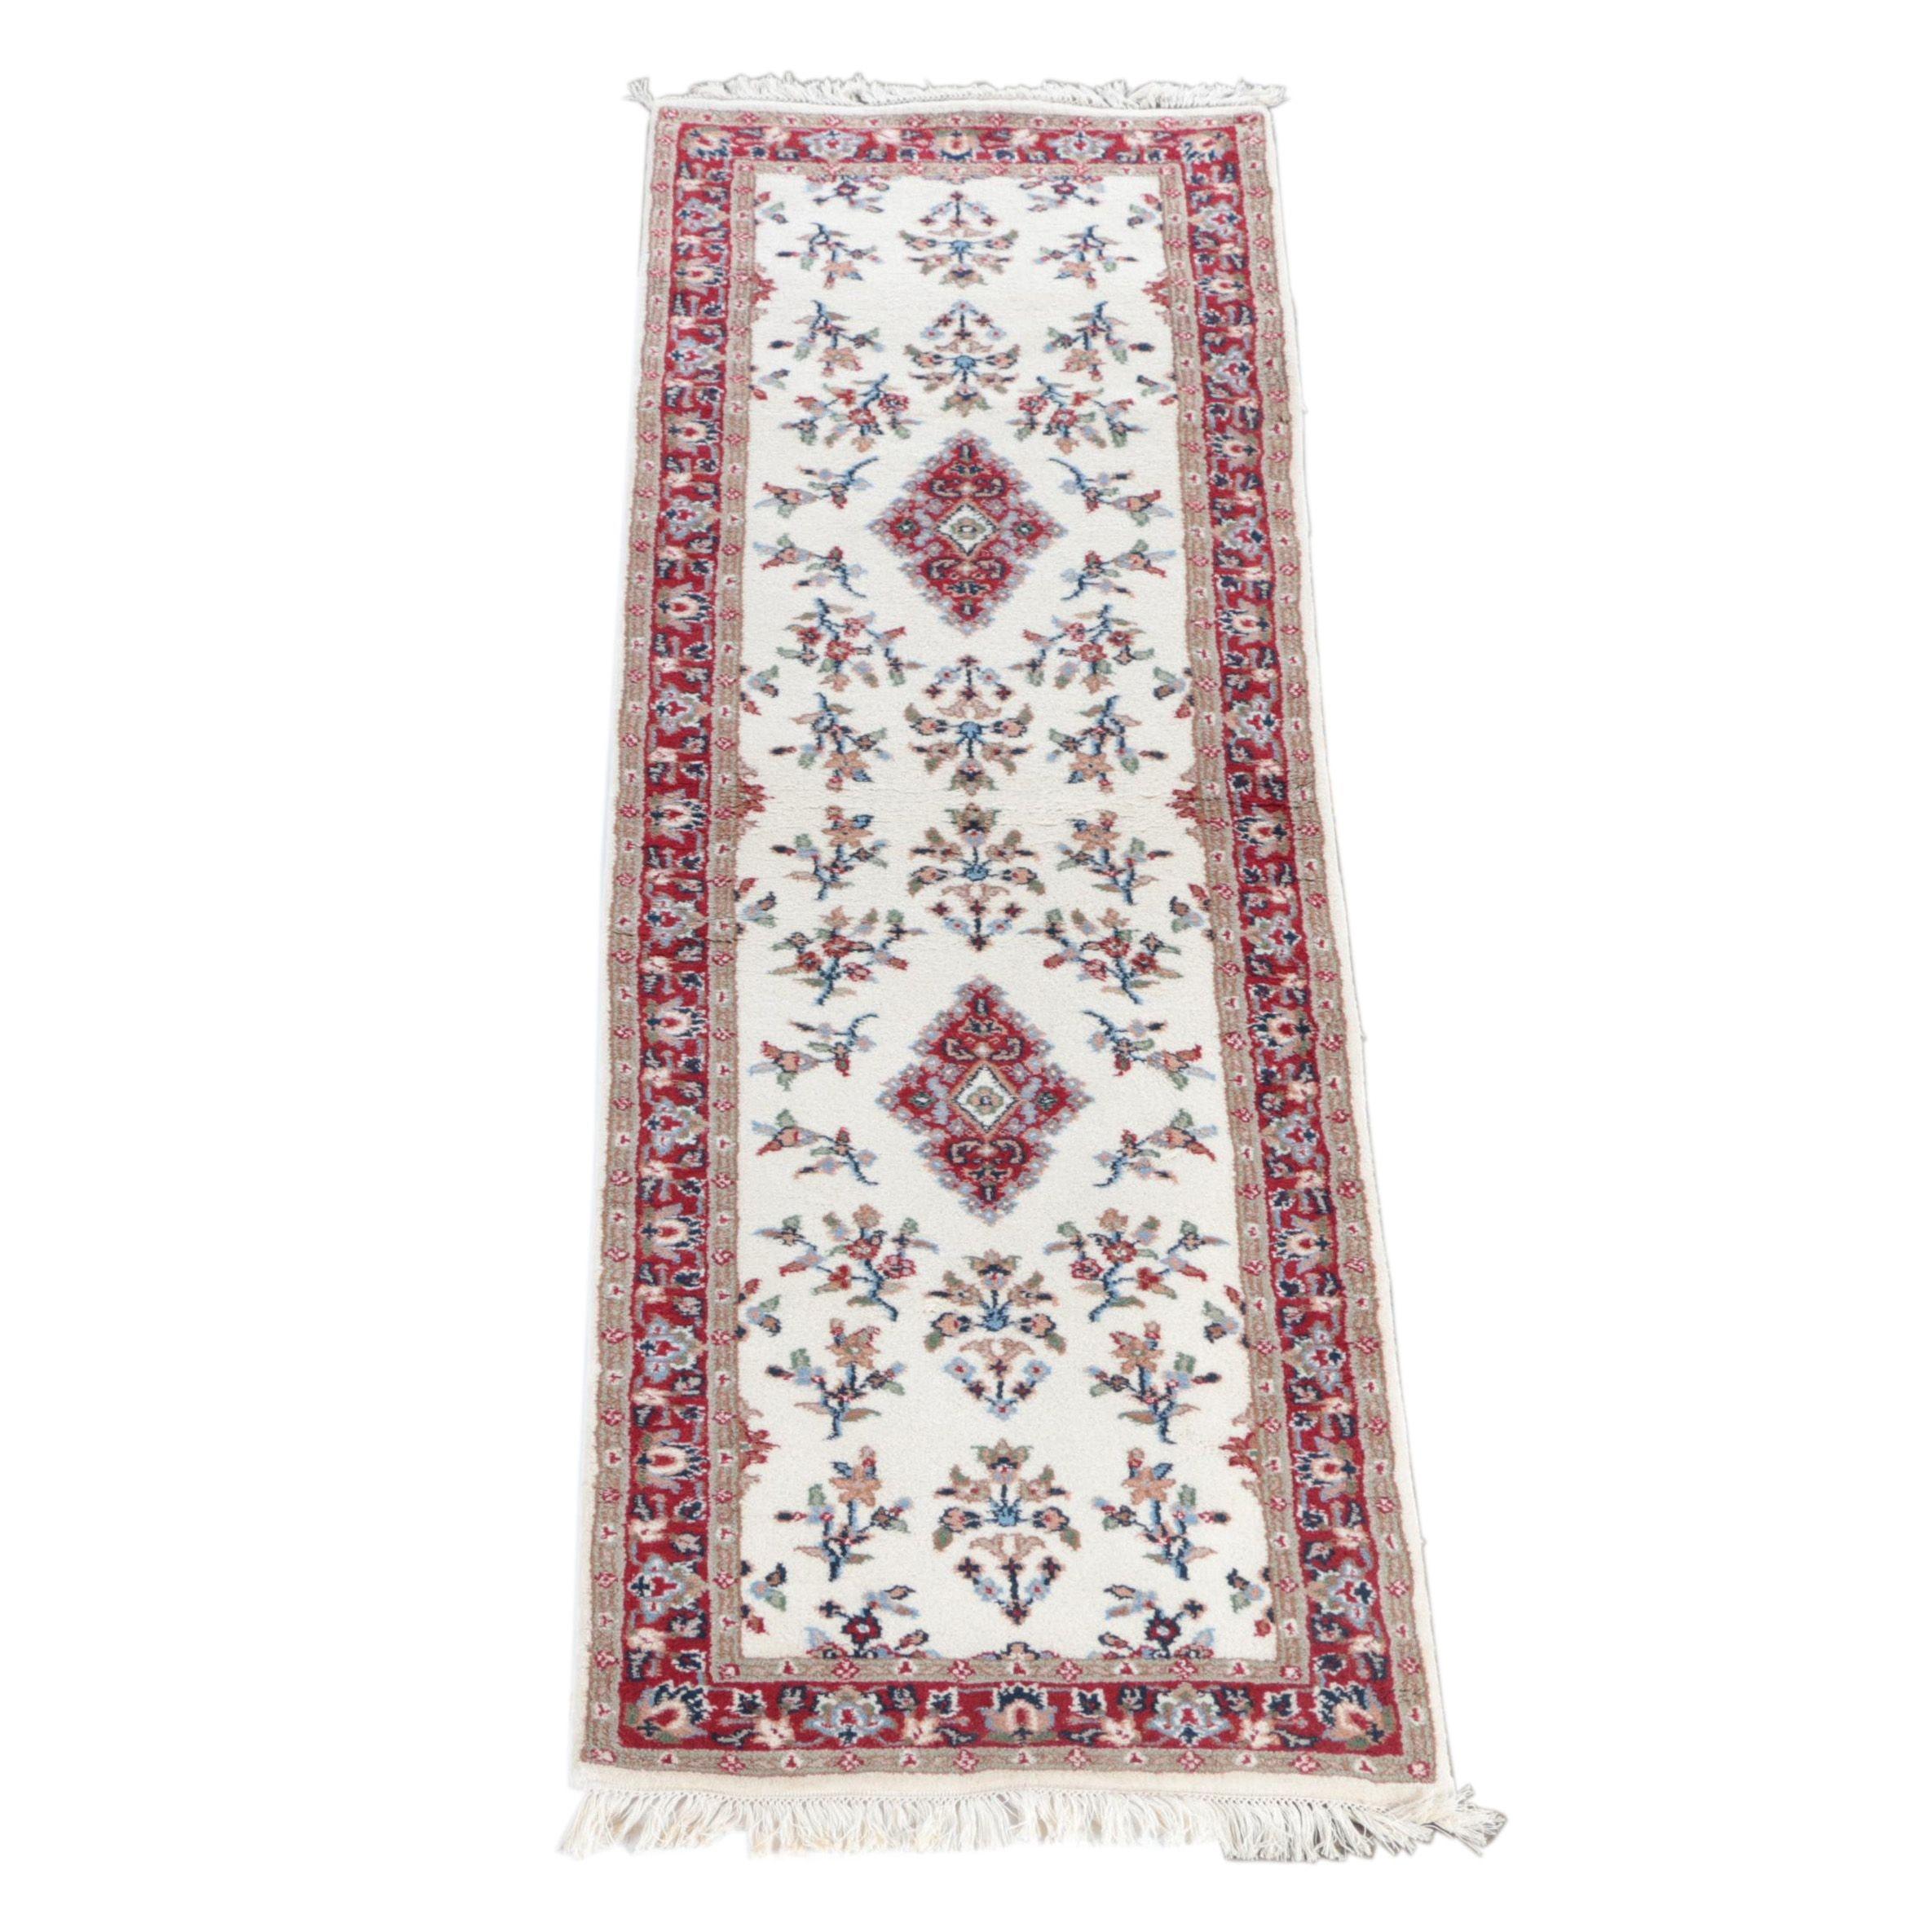 Hand-Knotted Indo-Sarouk Carpet Runner